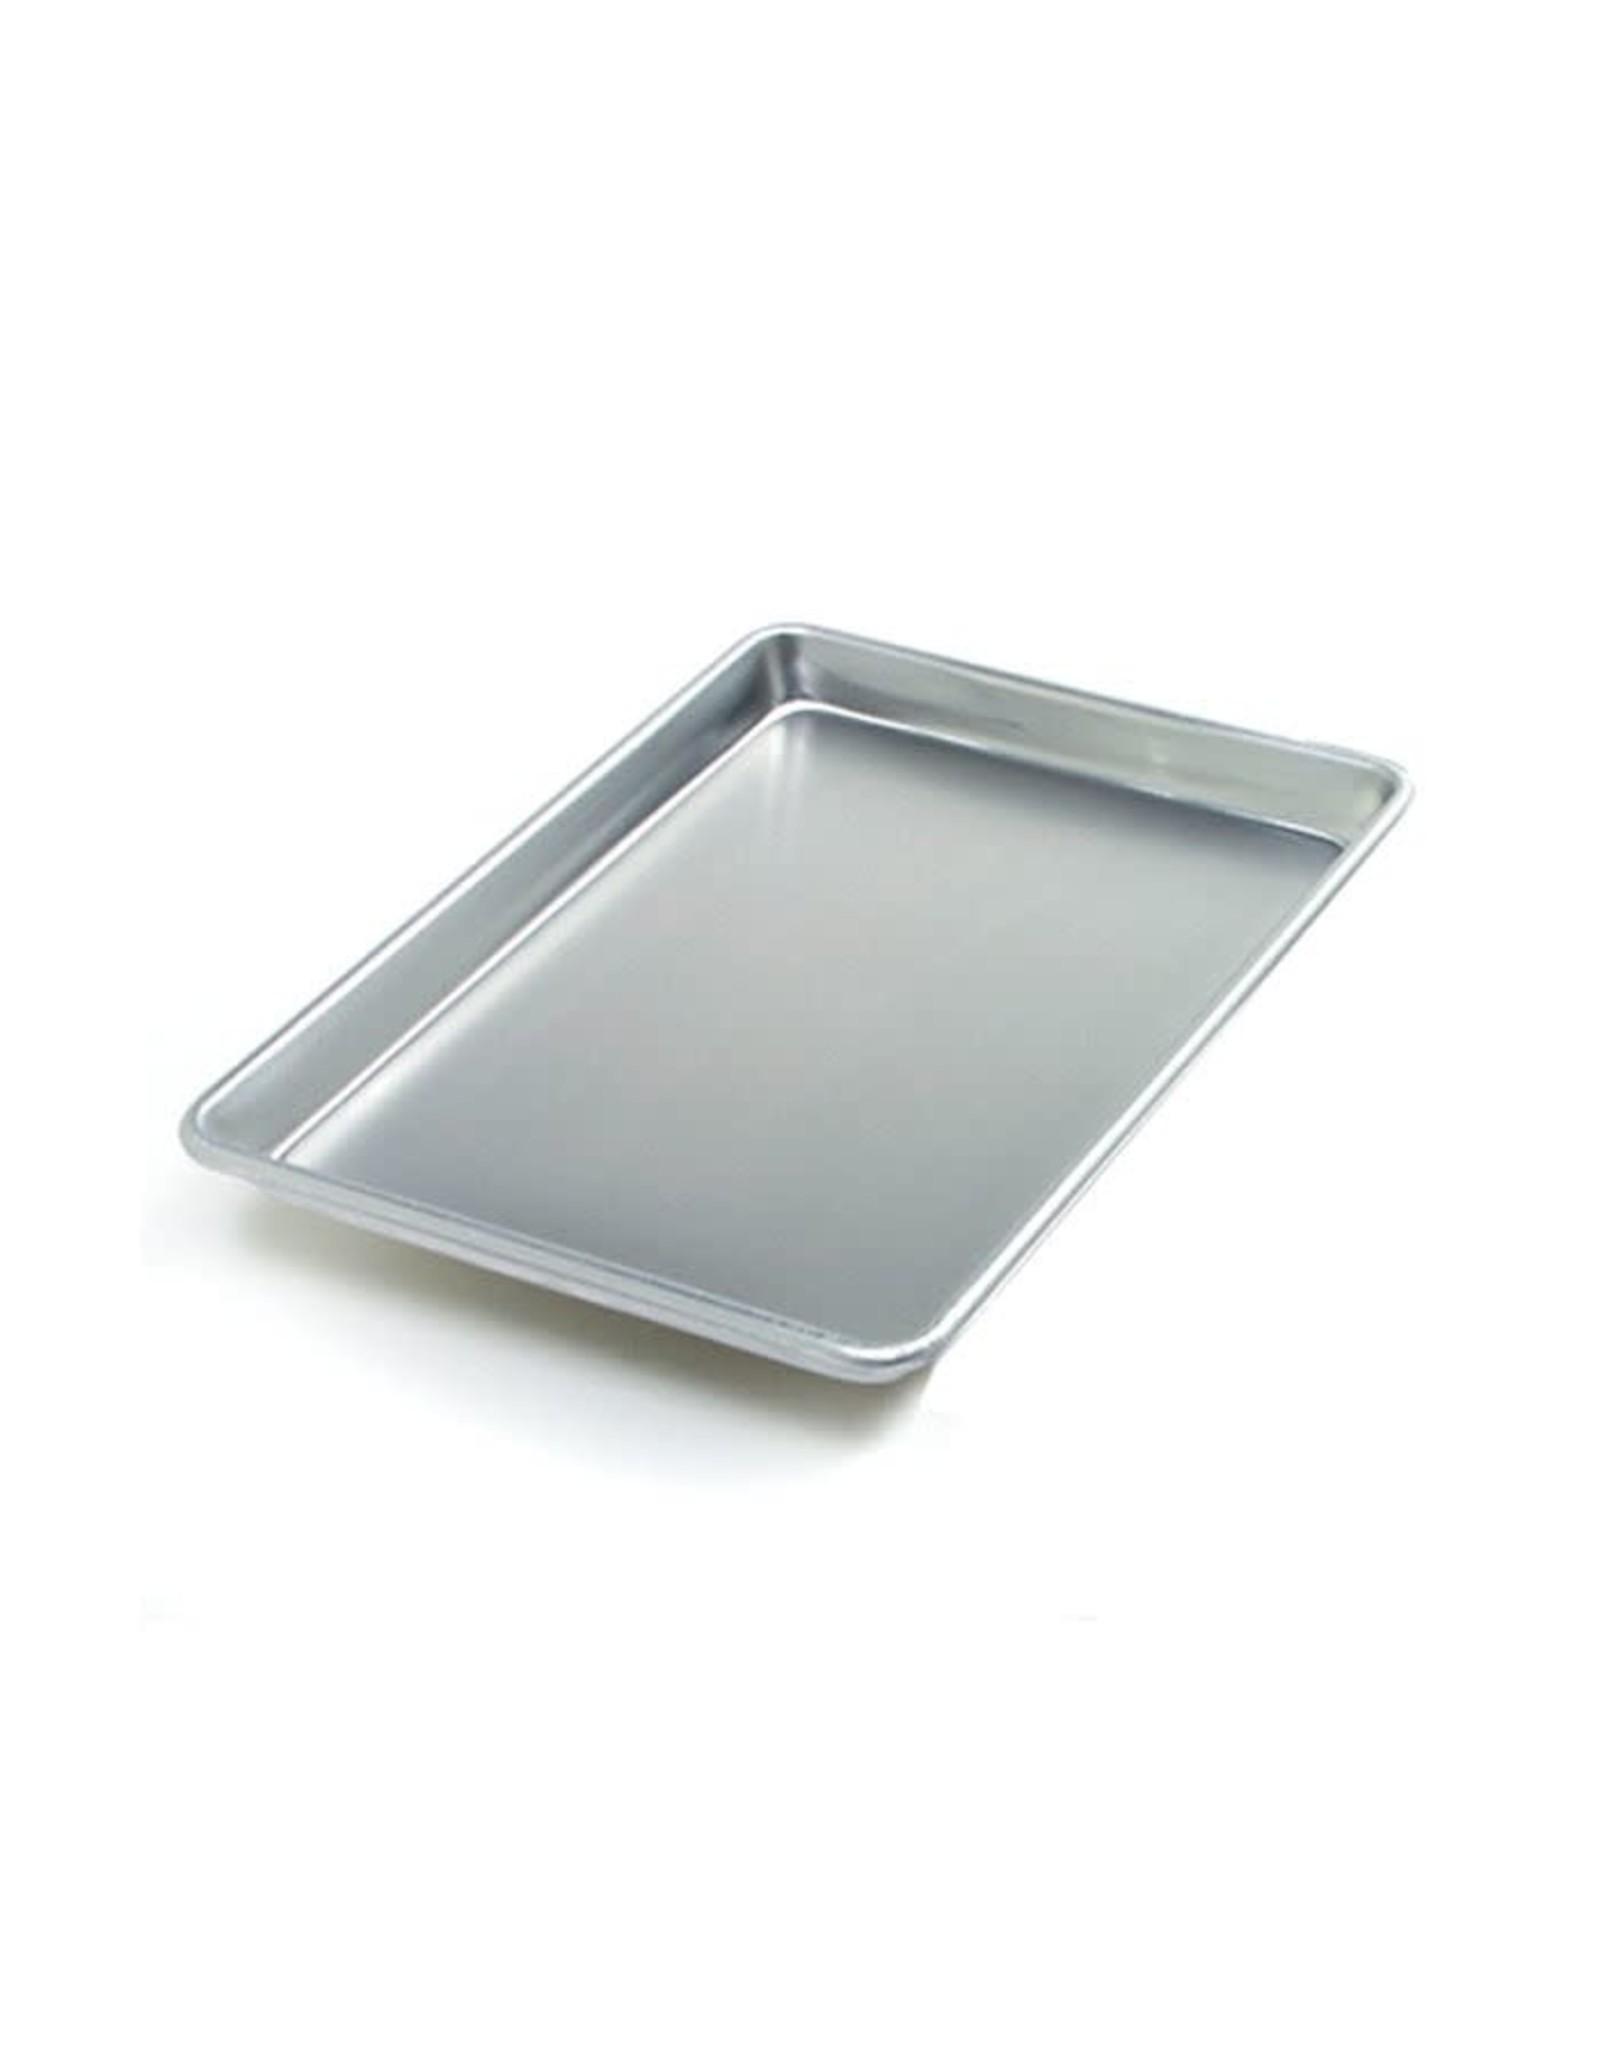 Norpro Jelly Roll Baking Pan, 9.5x13